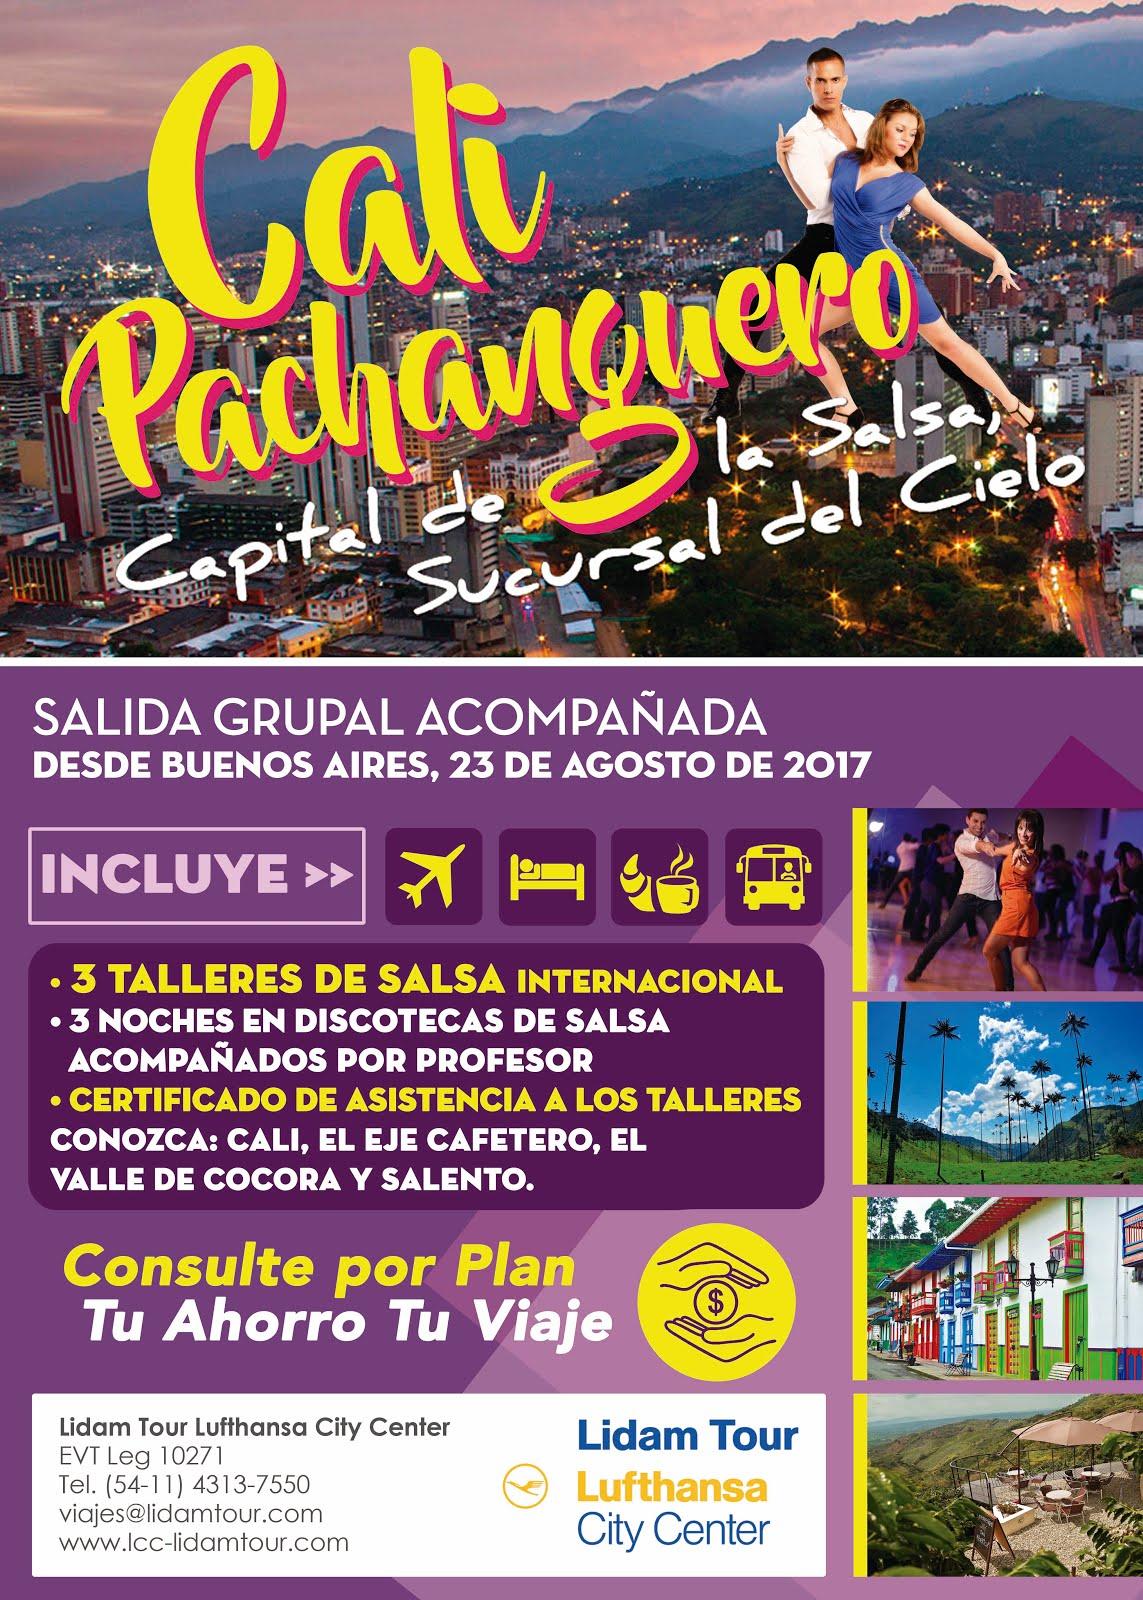 Tour Cali Pachanguero 2017